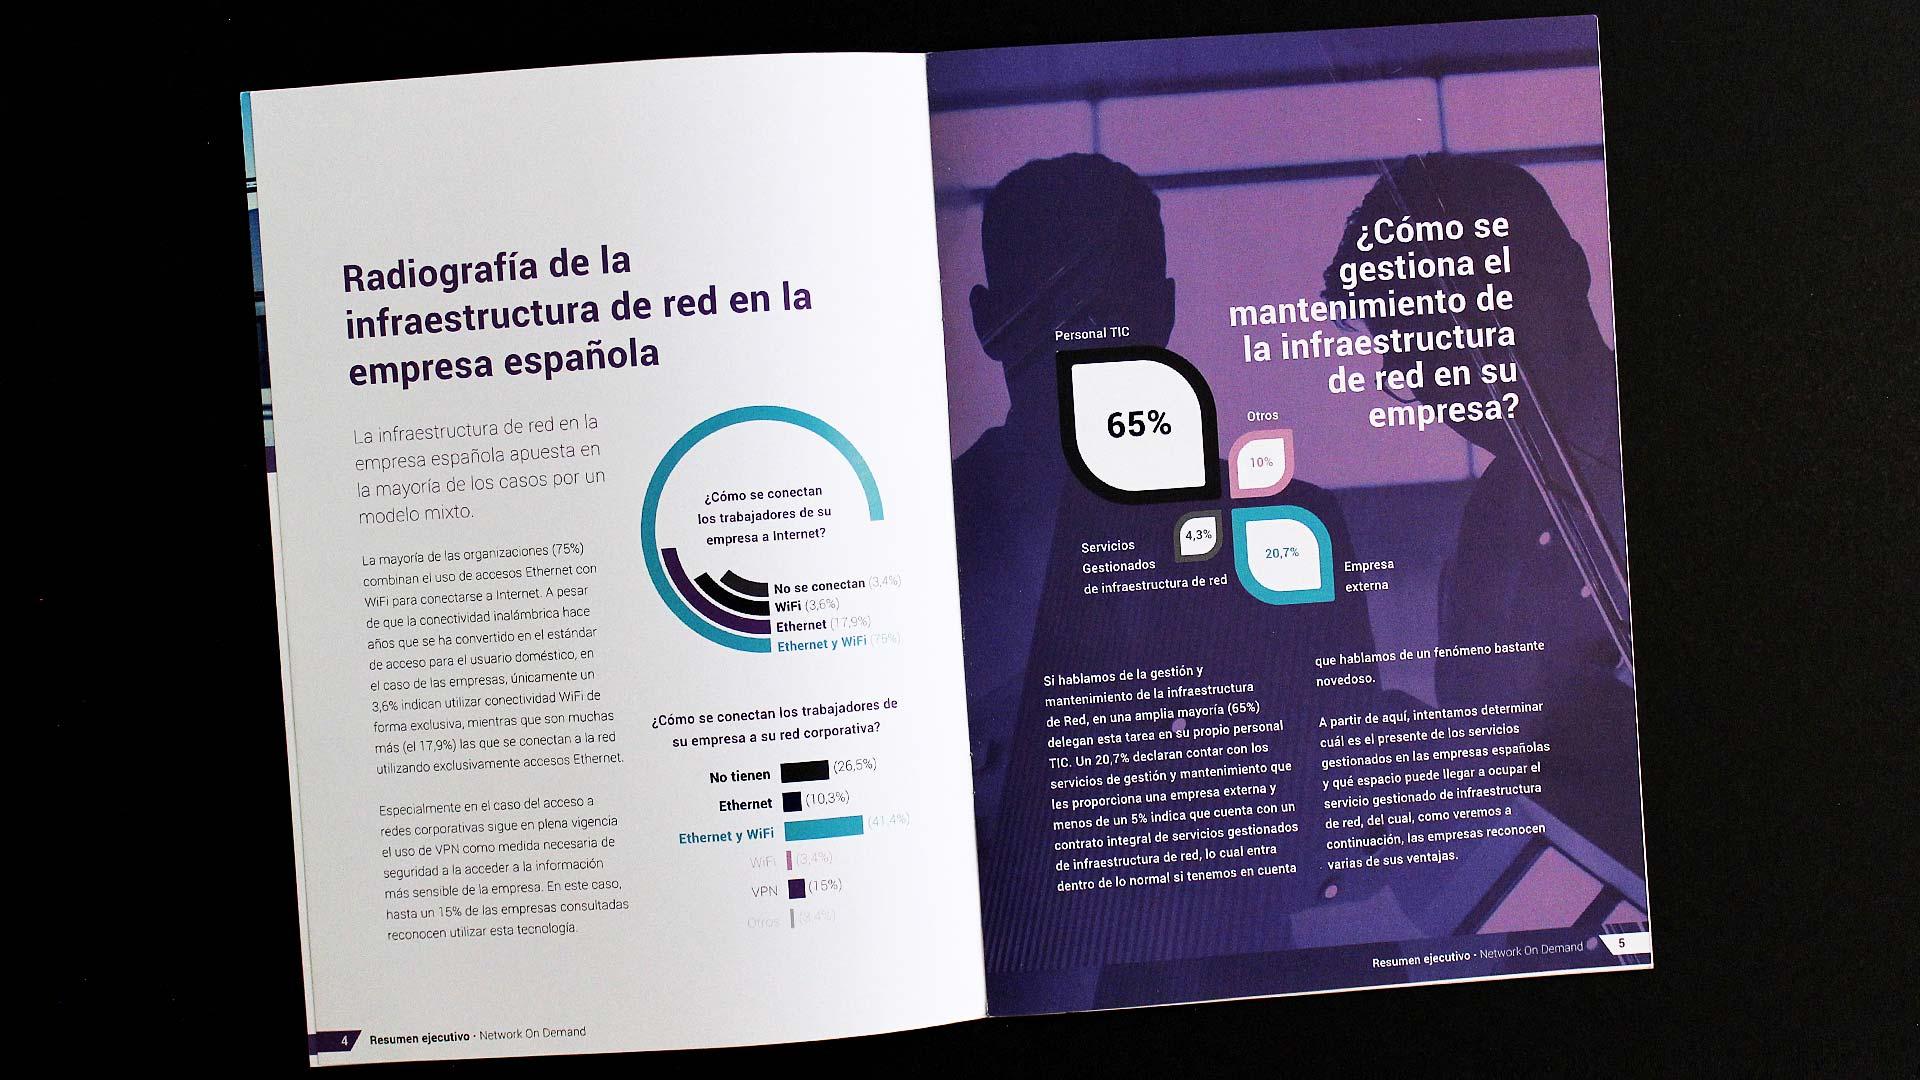 alcatel-content-marketing-informe-resumen-ejecutivo-networkondemand-ebook-2016-04